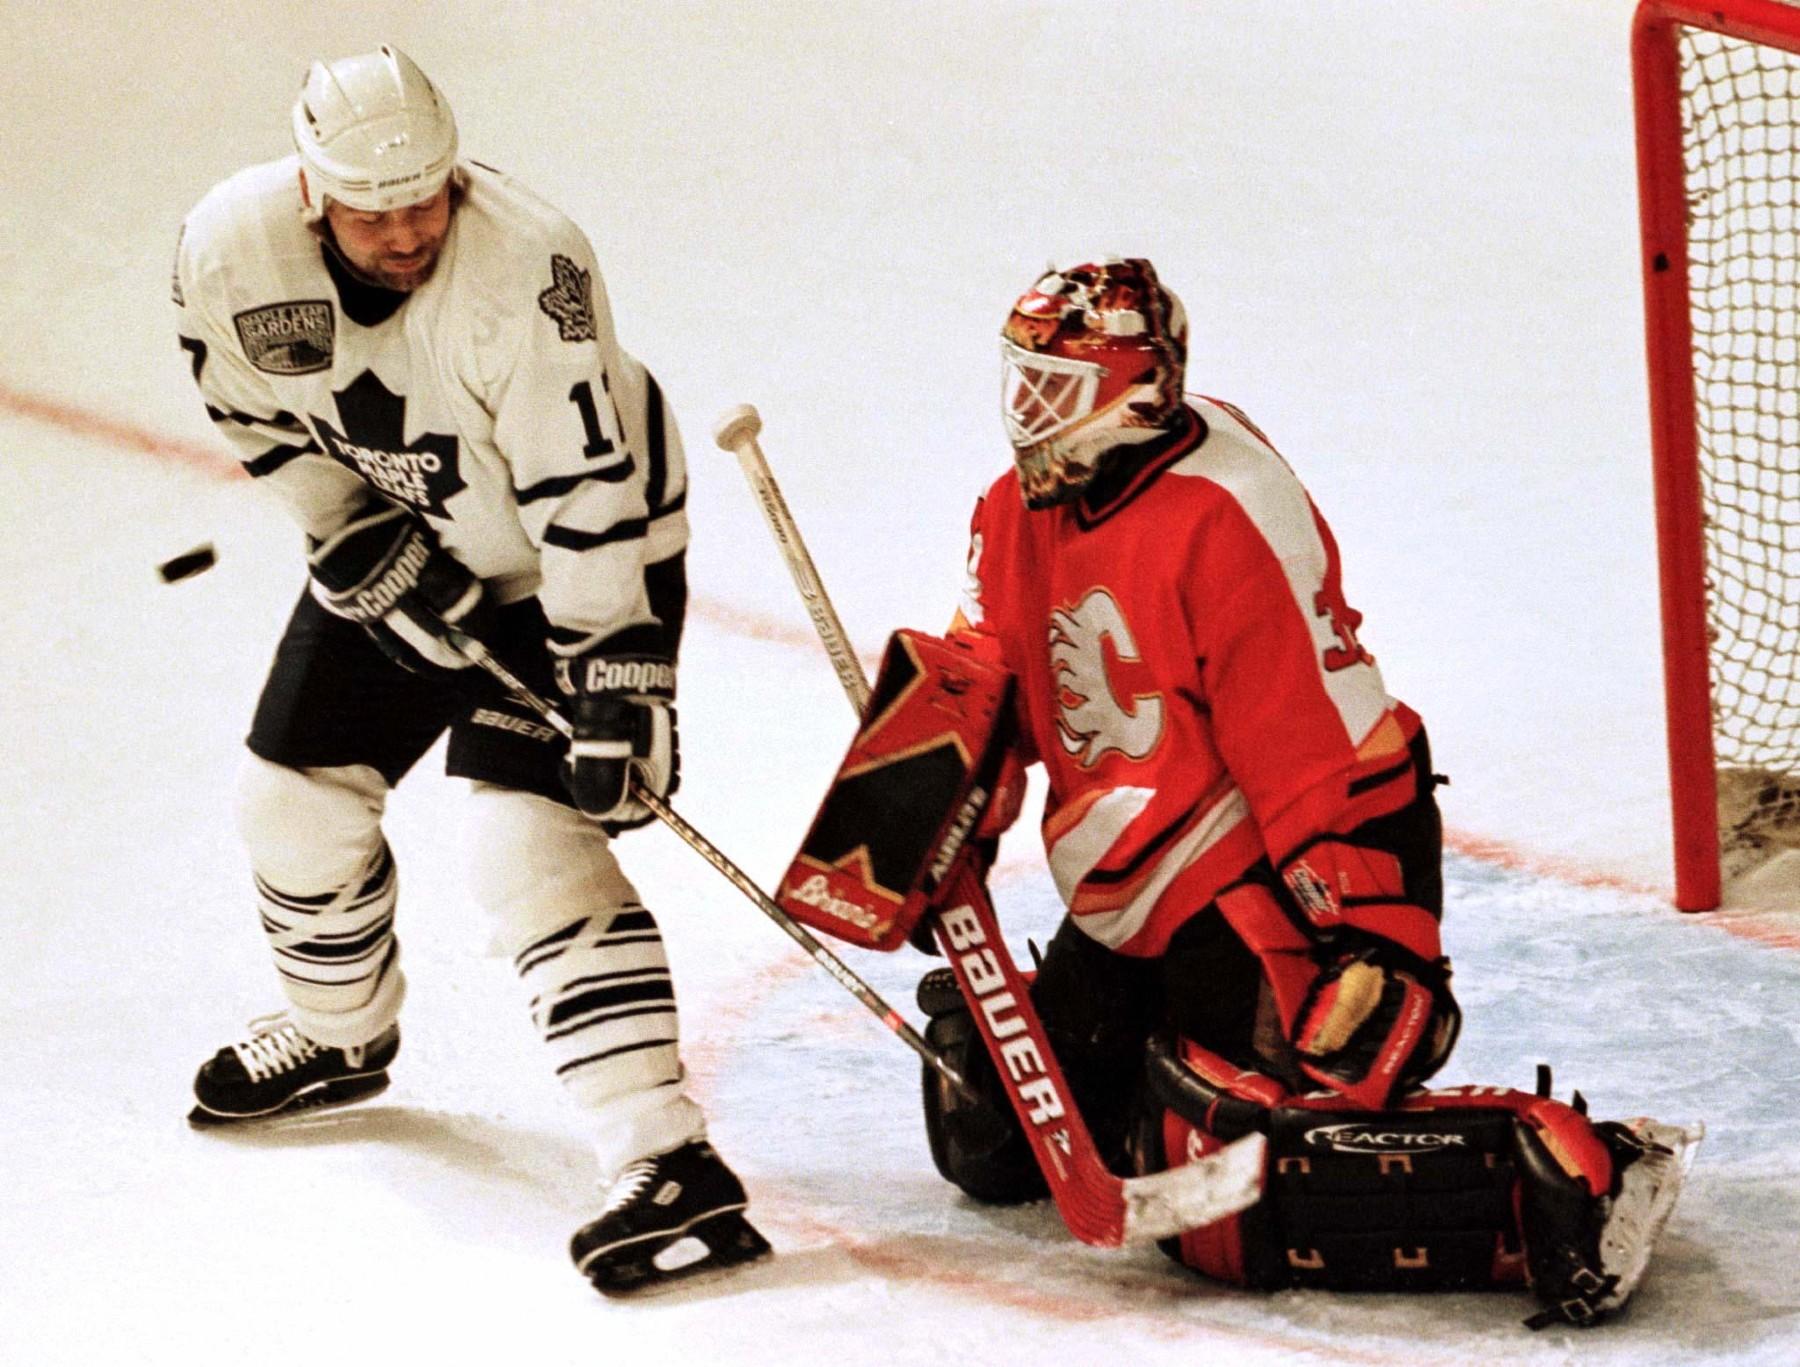 Why a Canadian Hockey Team's Name Recalls US Civil War Destruction